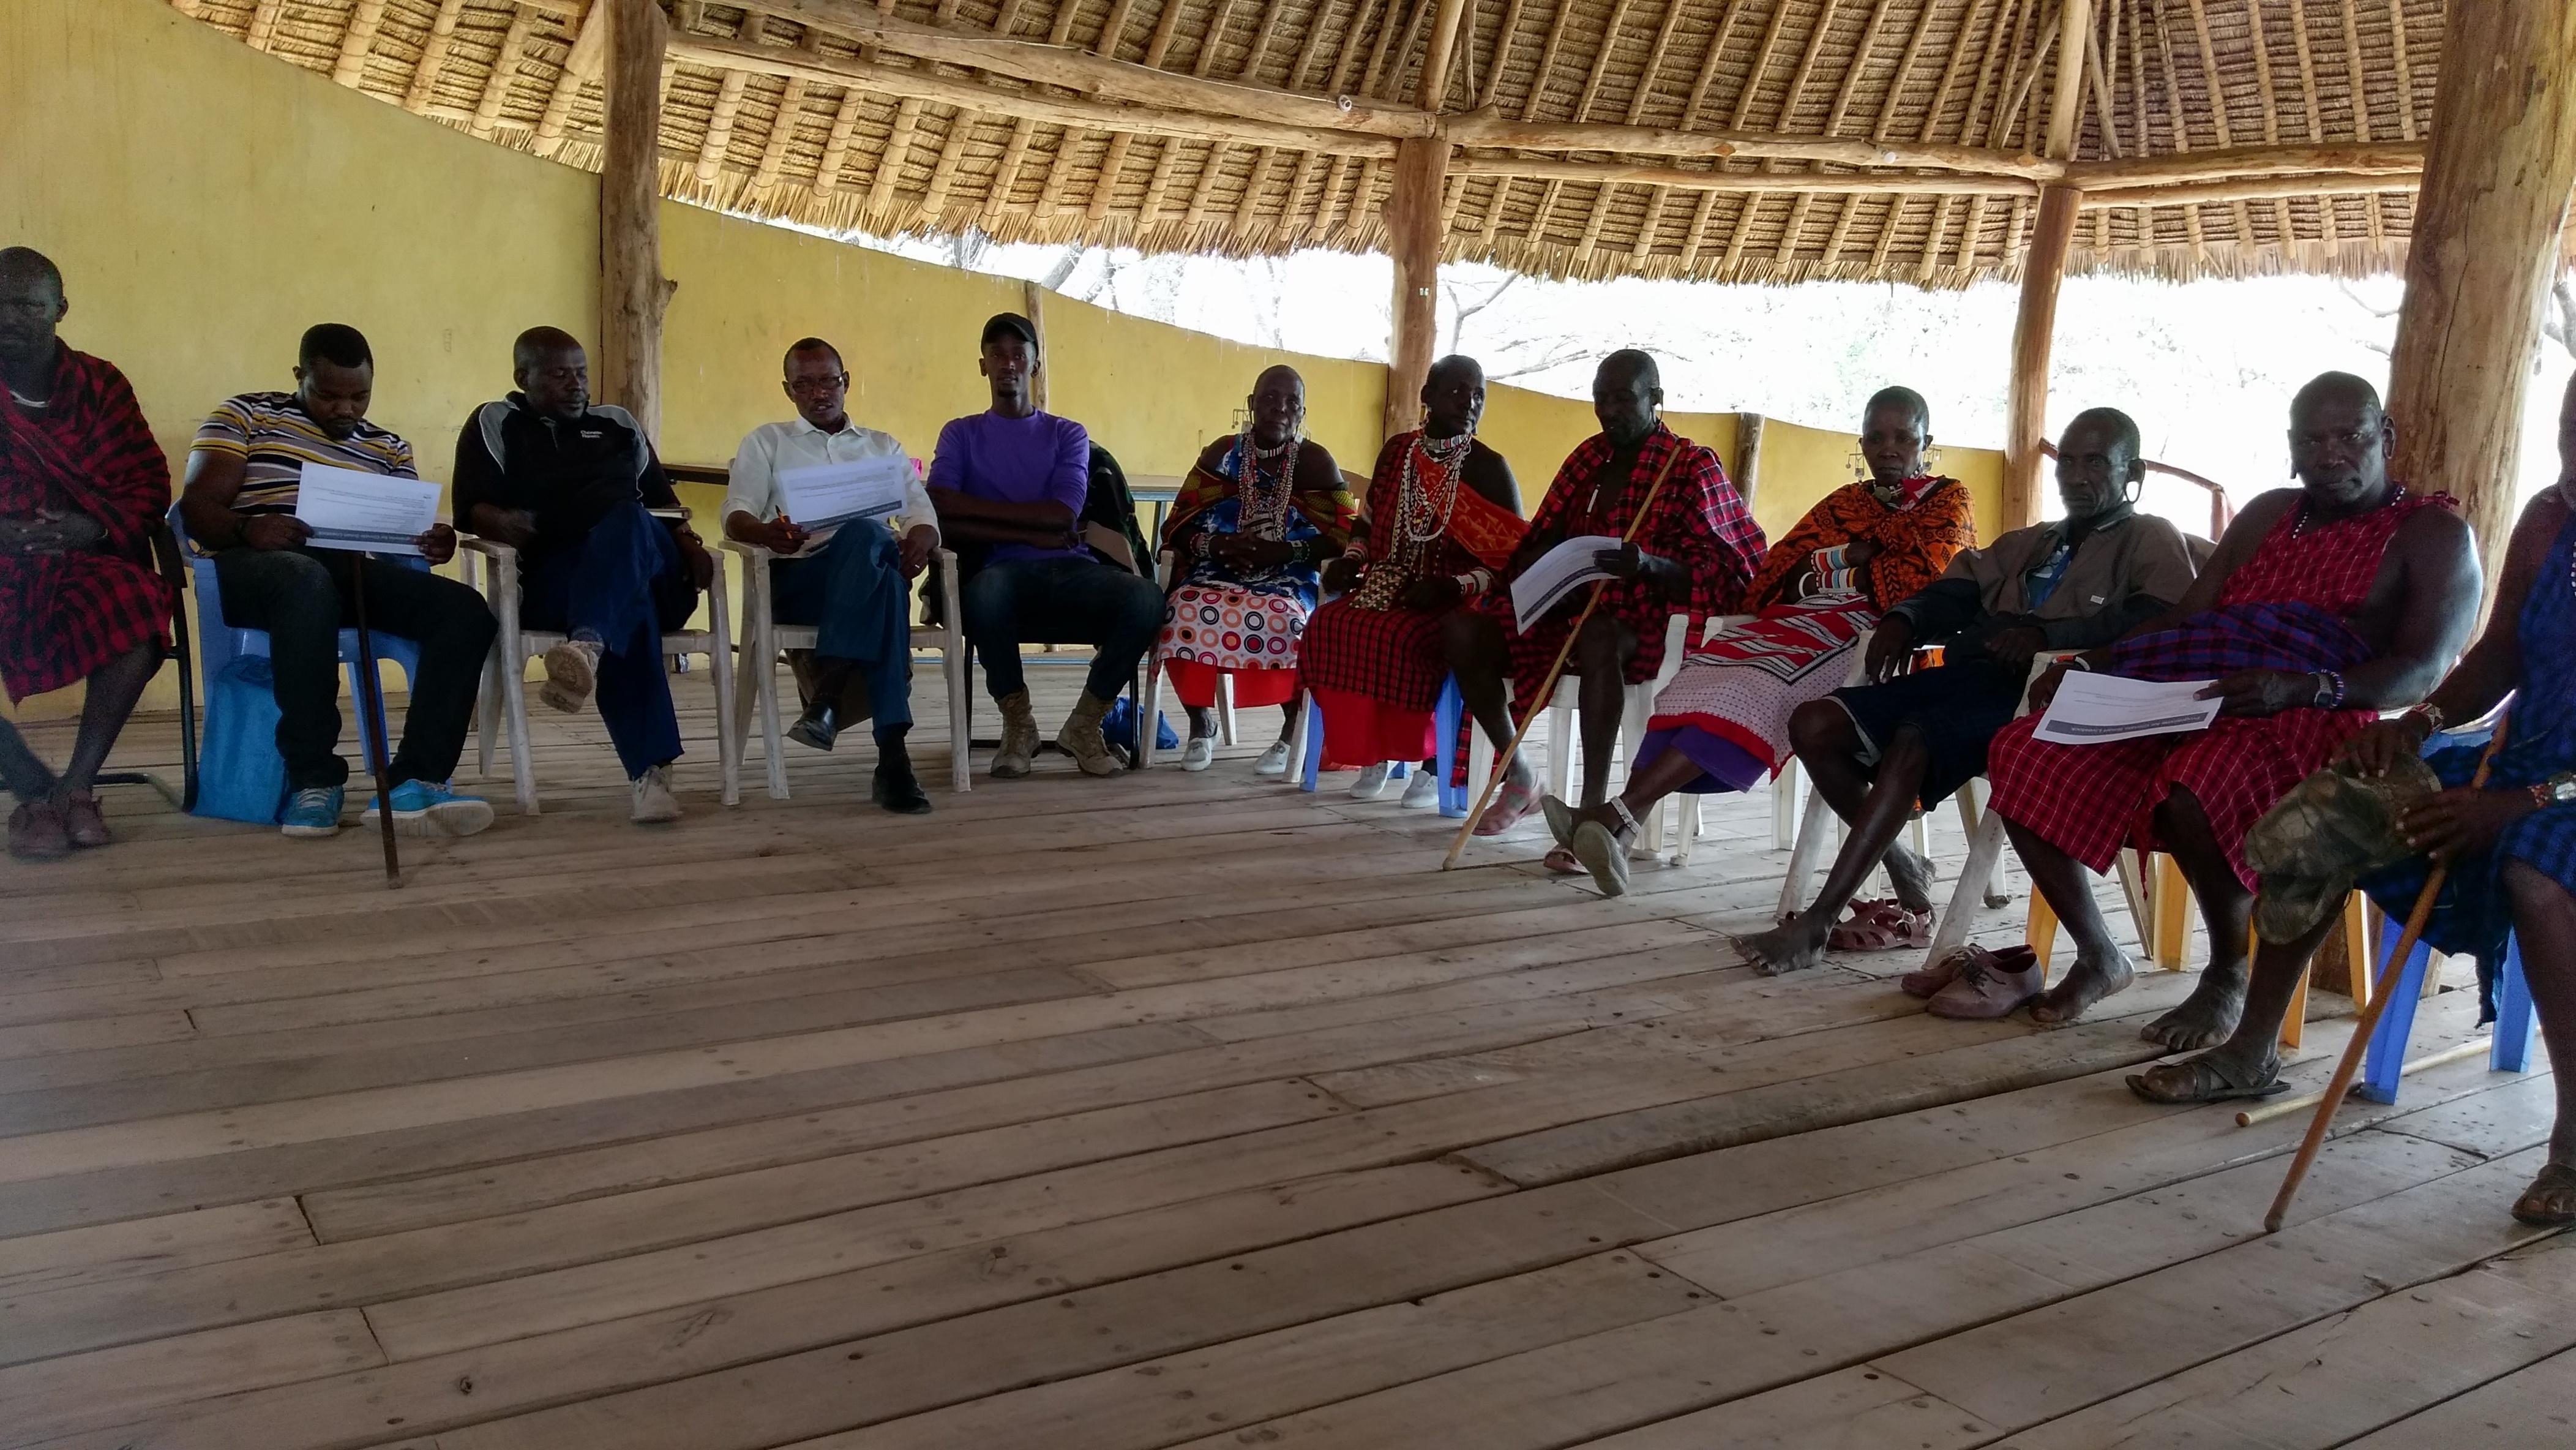 Members of Ol Kirmatian group ranch in Kajiado County, during the PCSL meeting held 25th June 2019 (photo credit ILRI Lucy Njuguna)